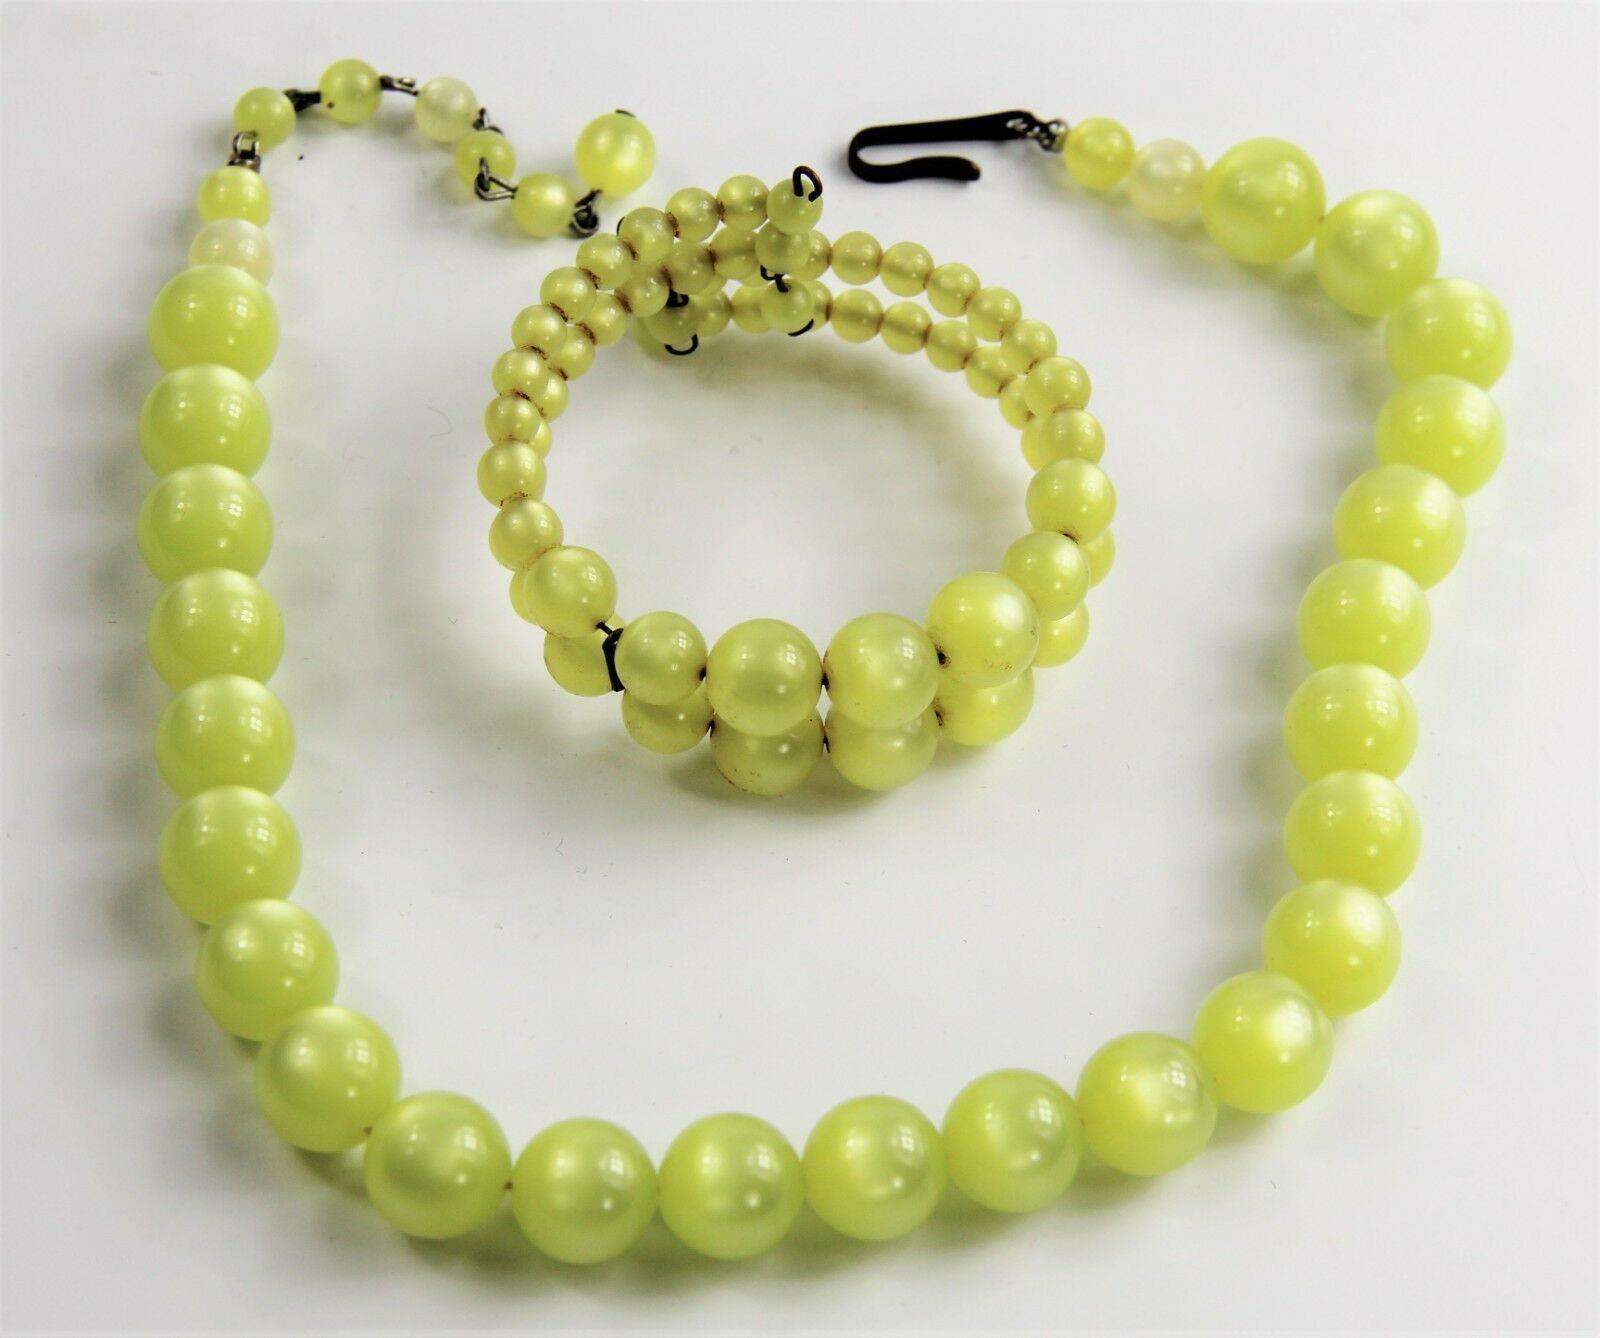 ESTATE VINTAGE Jewelry YELLOW  MOONGLOW PLASTIC SET COIL BRACELET &  NECKLACE